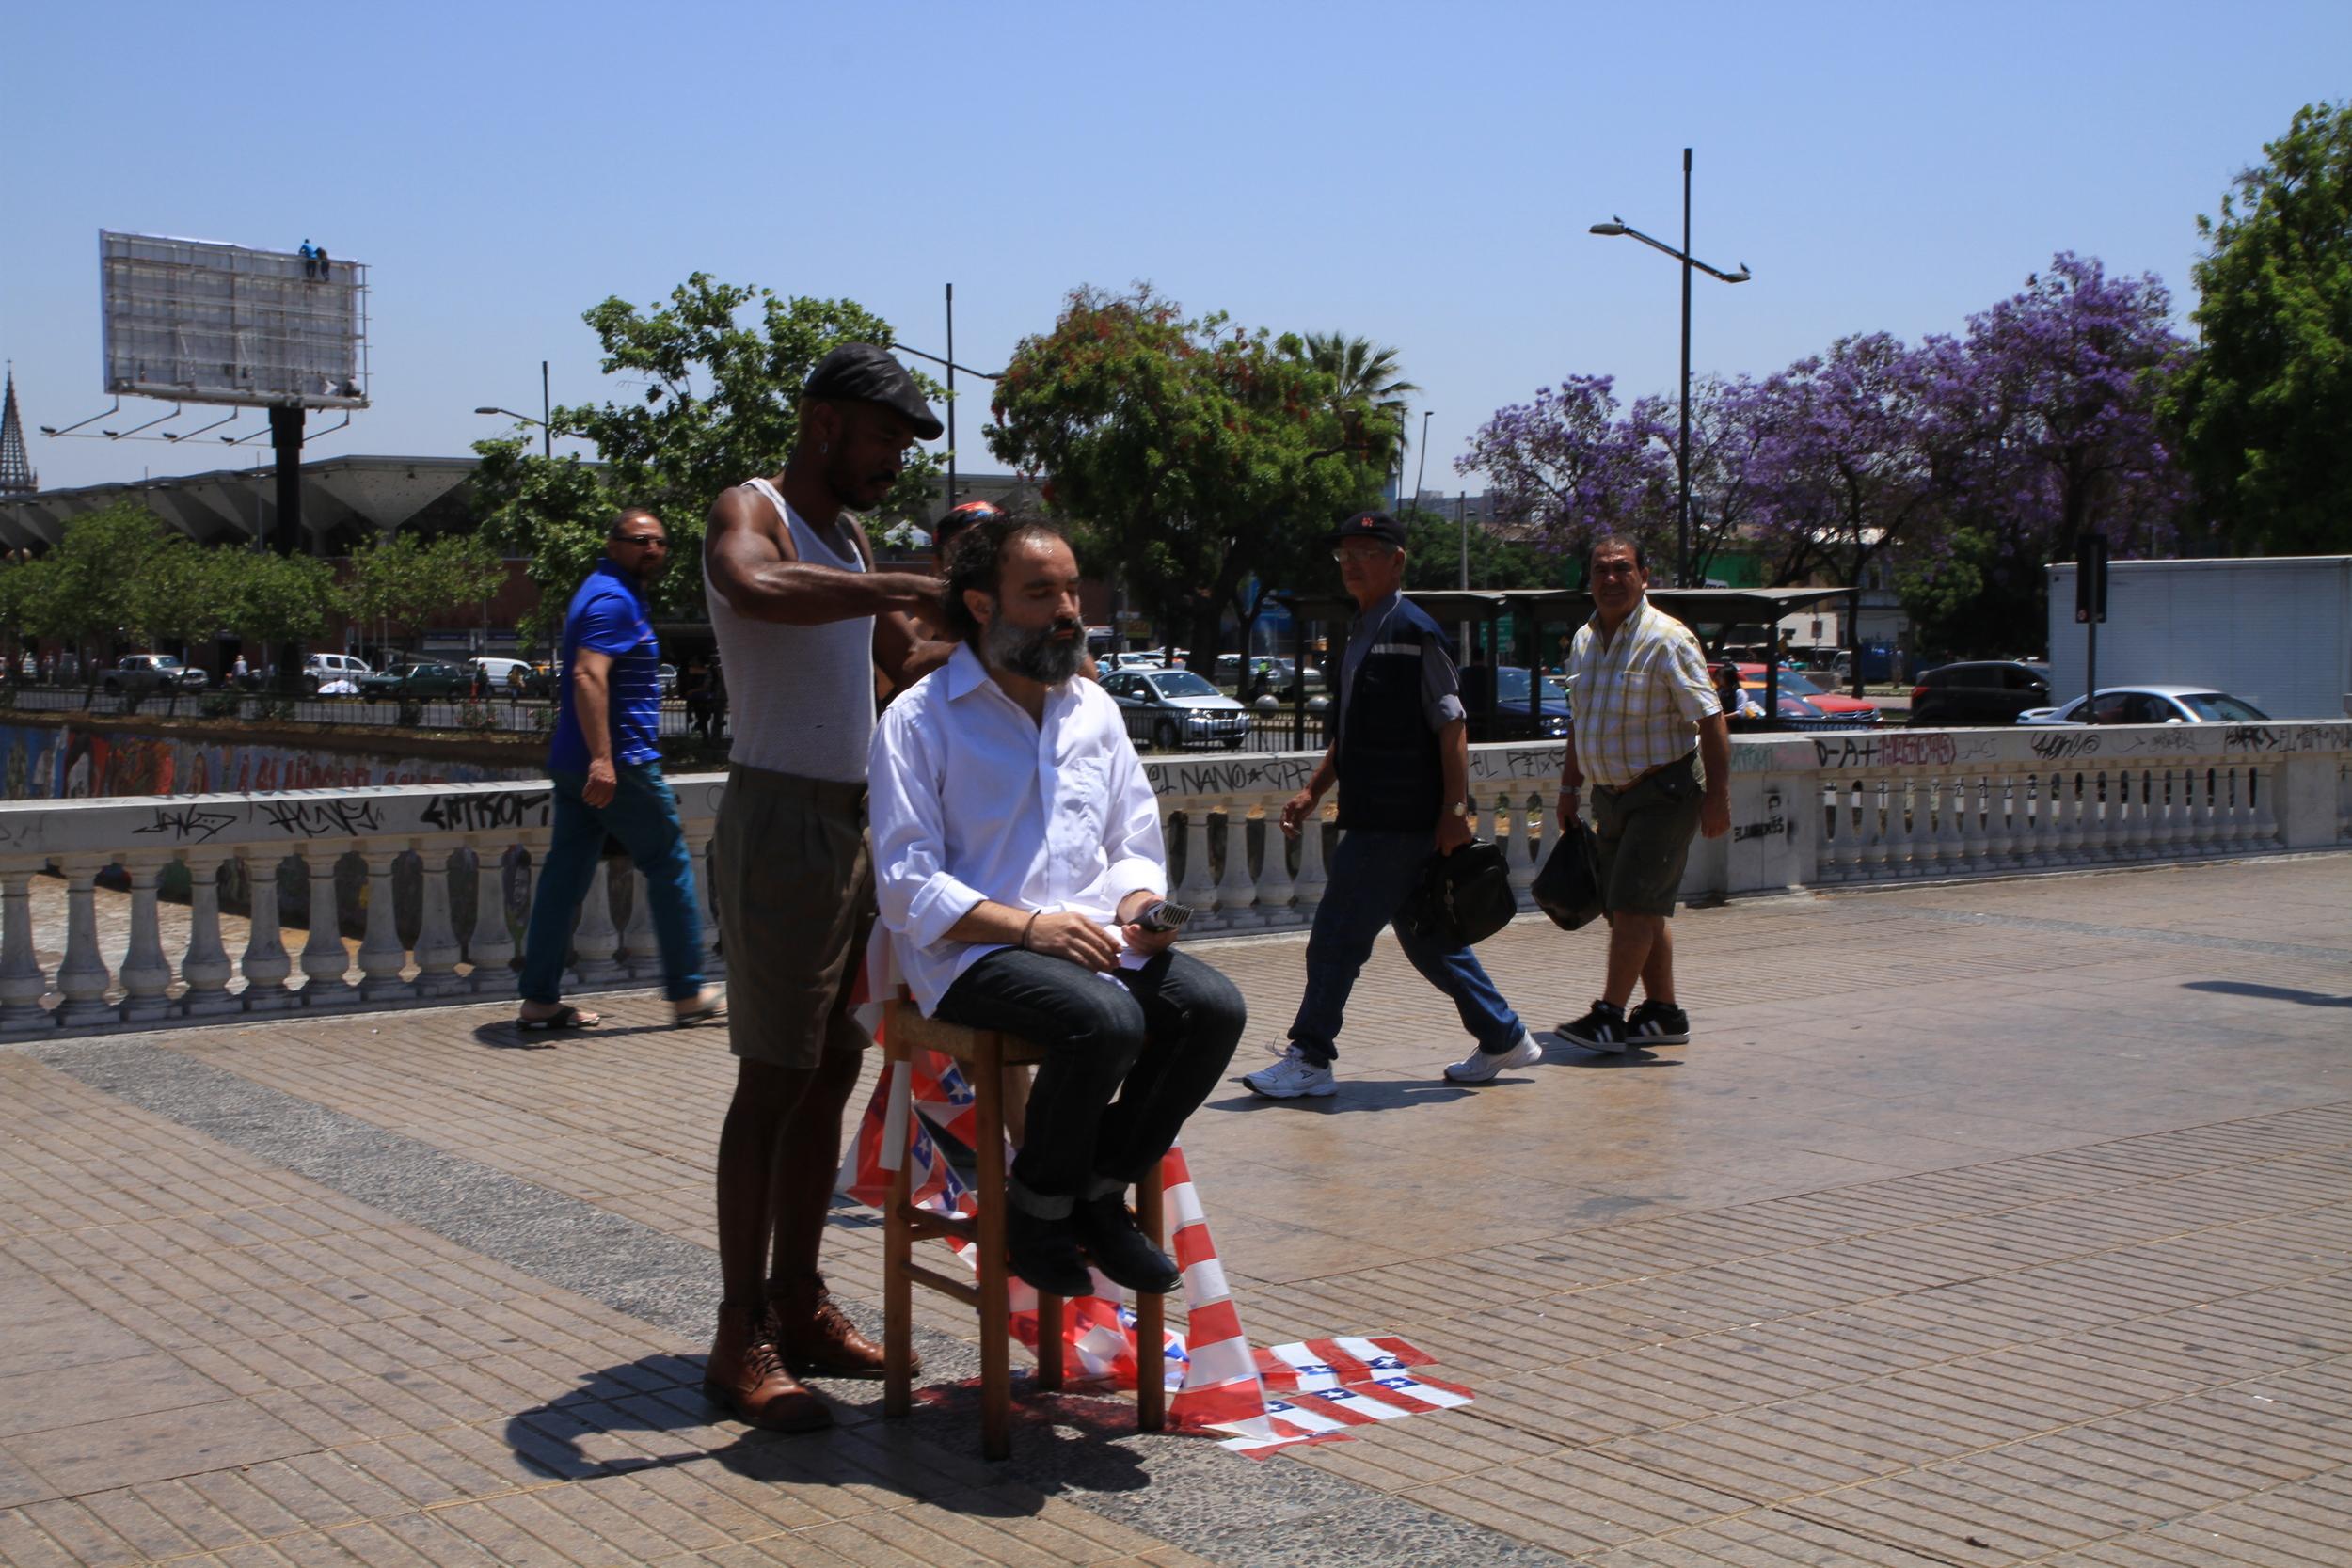 Canto al Río, intervention. script/idea HGJ. Soundscape CamiloGarcía Chain. Visual witness JavieraOvalle Sazié. Puente Recoleta, Santiago de Chile. 11/2014.